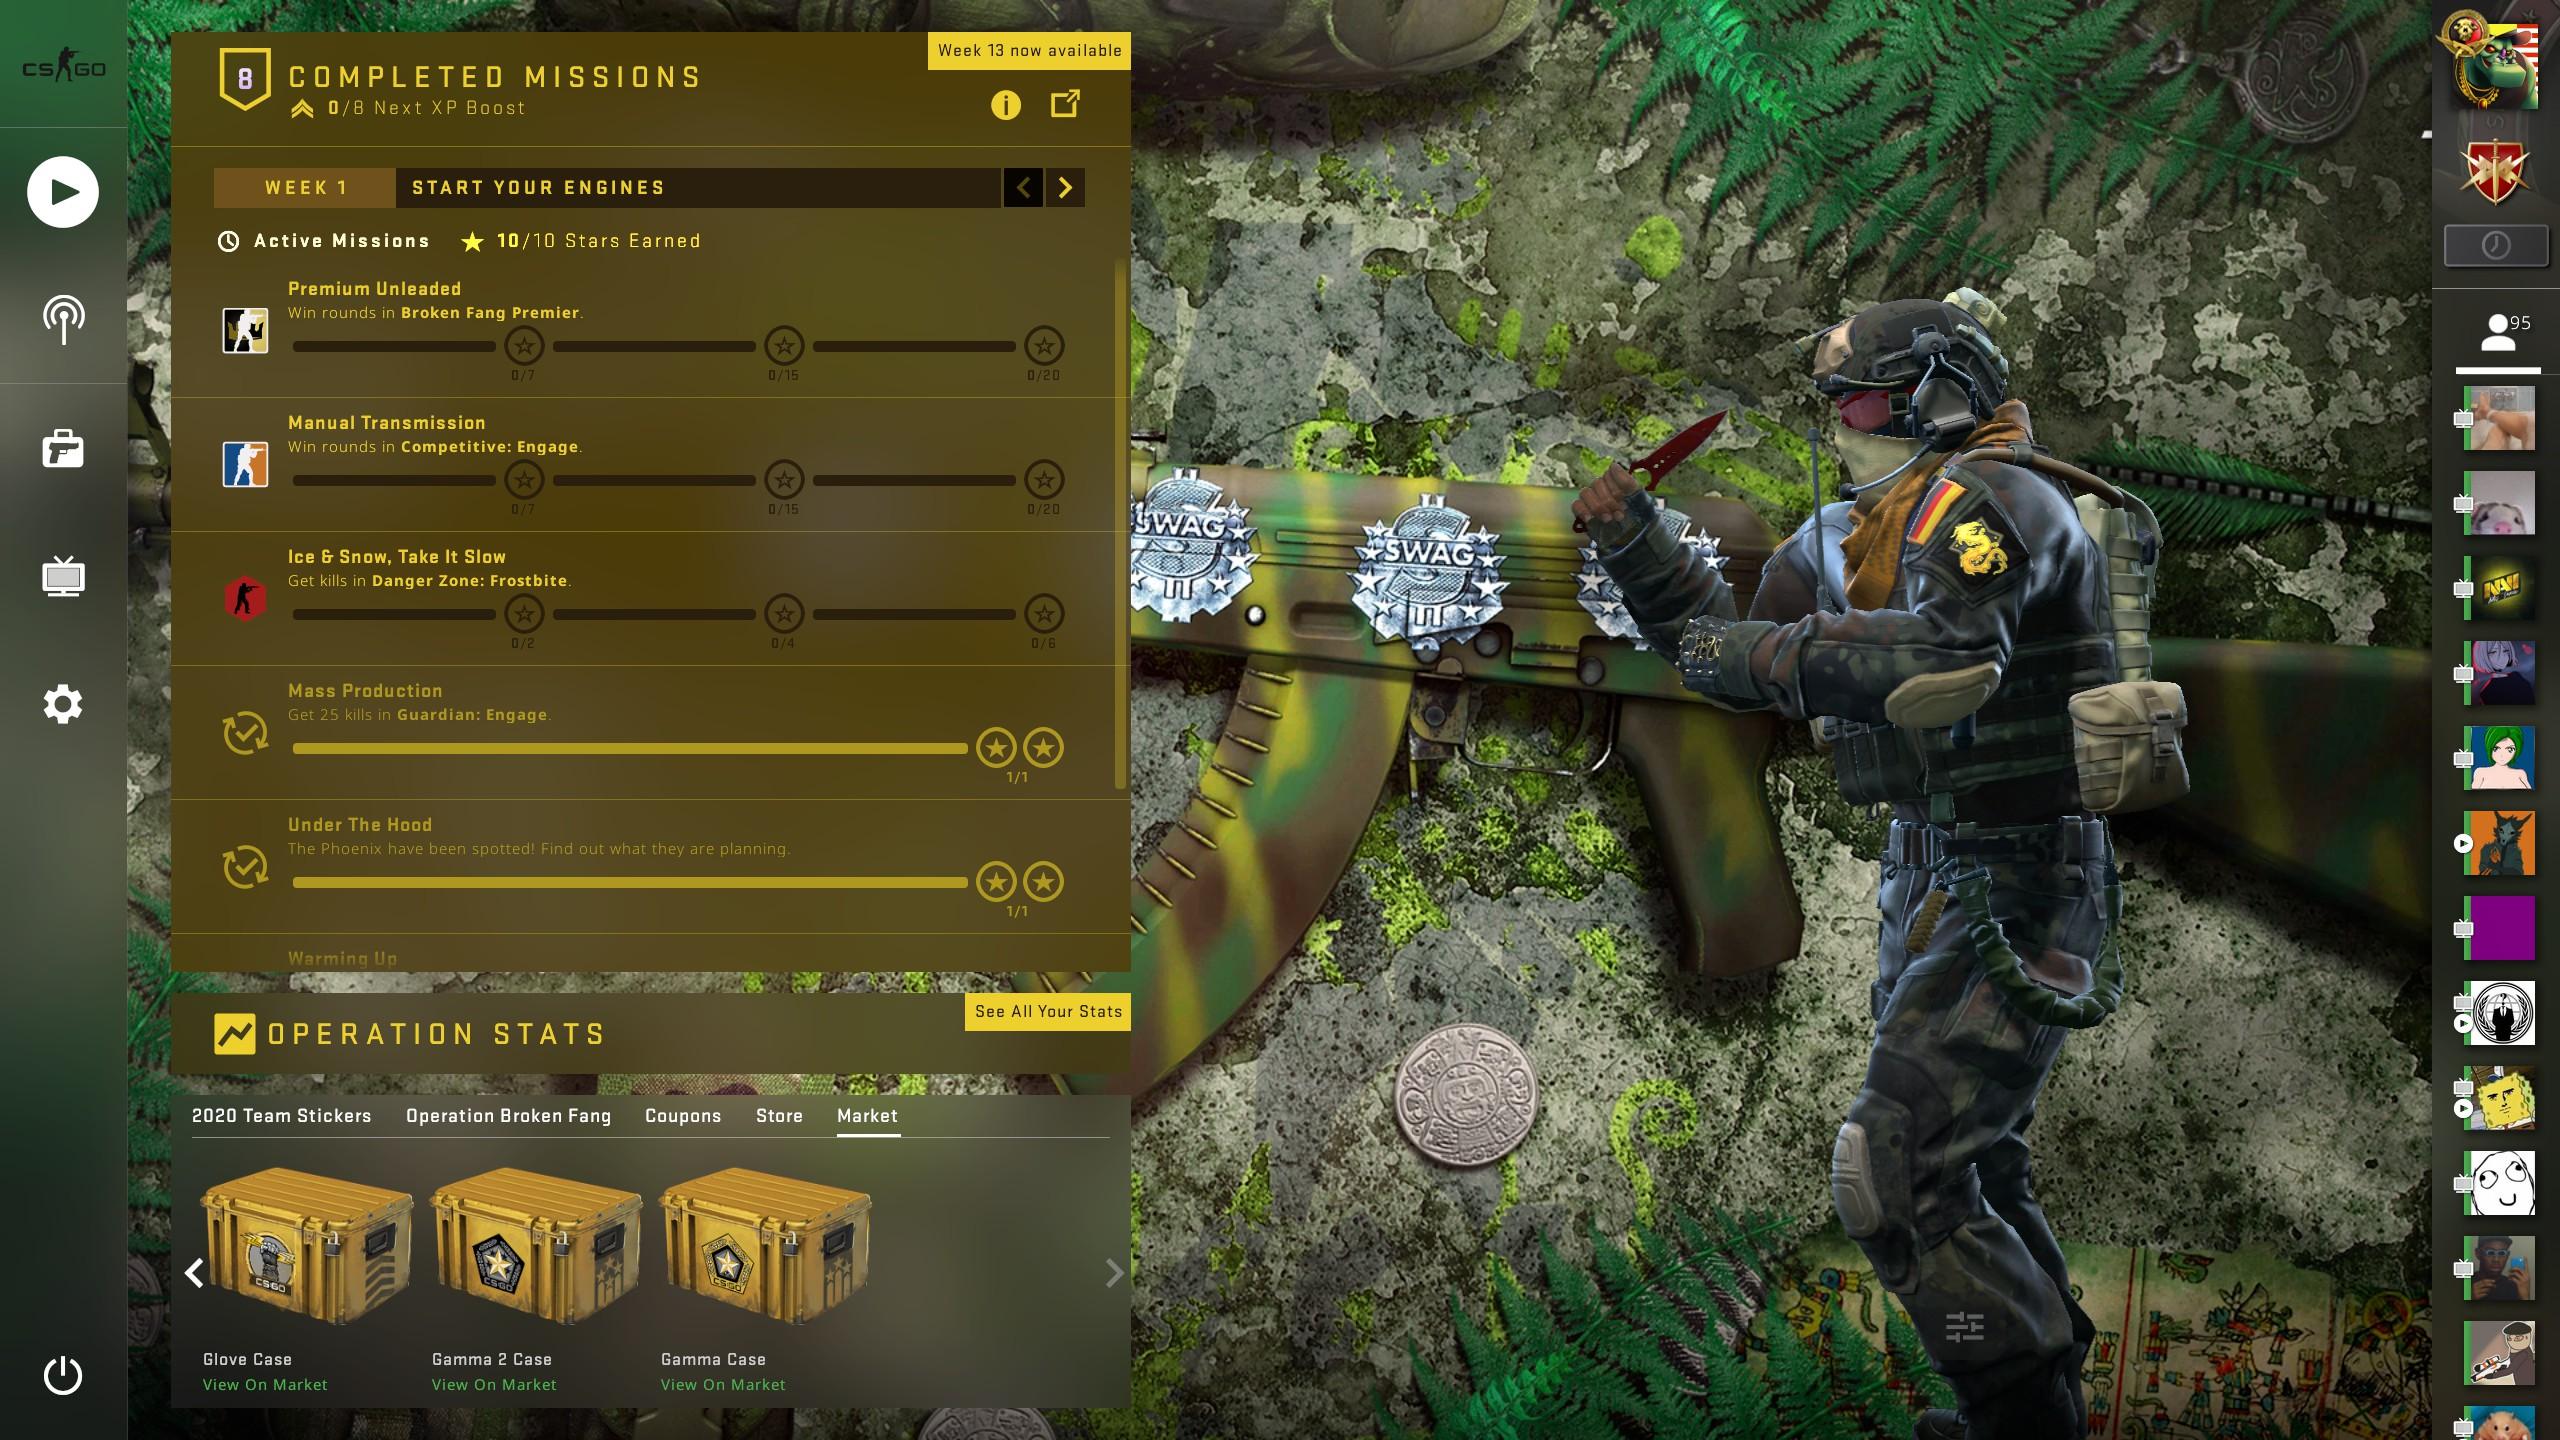 Ak-47 SWAG CSGO Panorama UI Background Preview